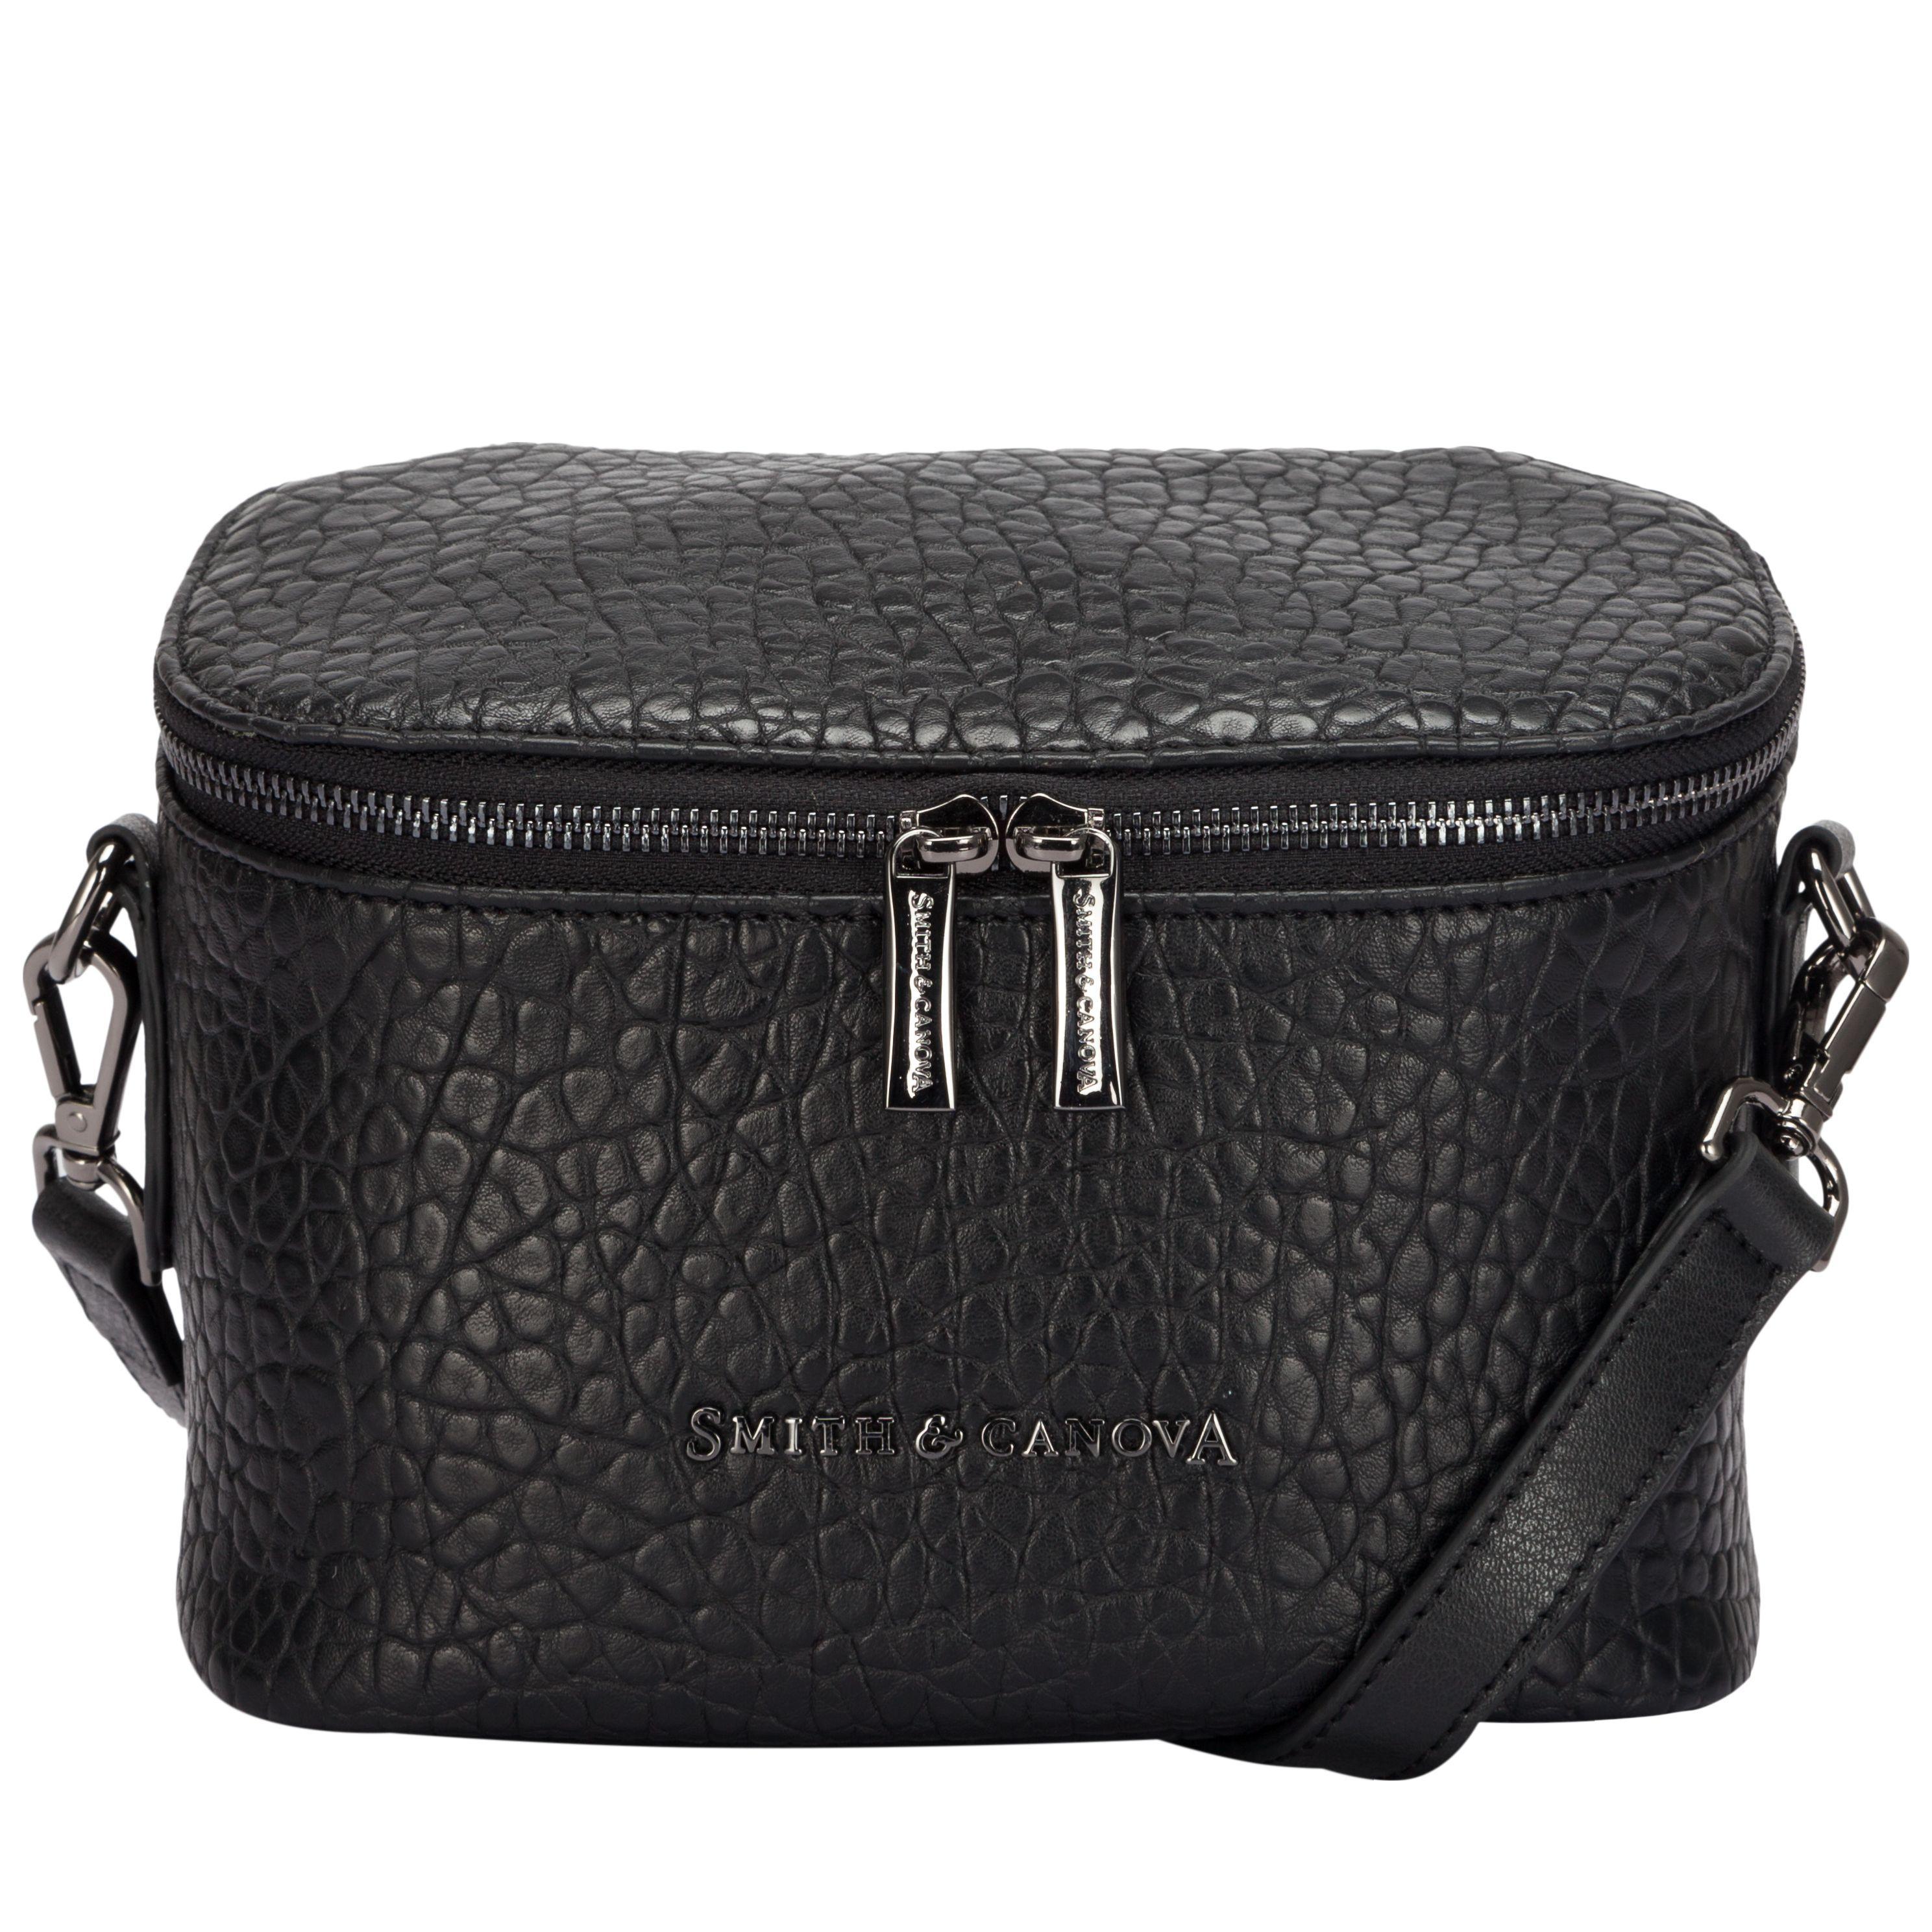 Smith & Canova Leather Marta Cross Bady Bag in Black